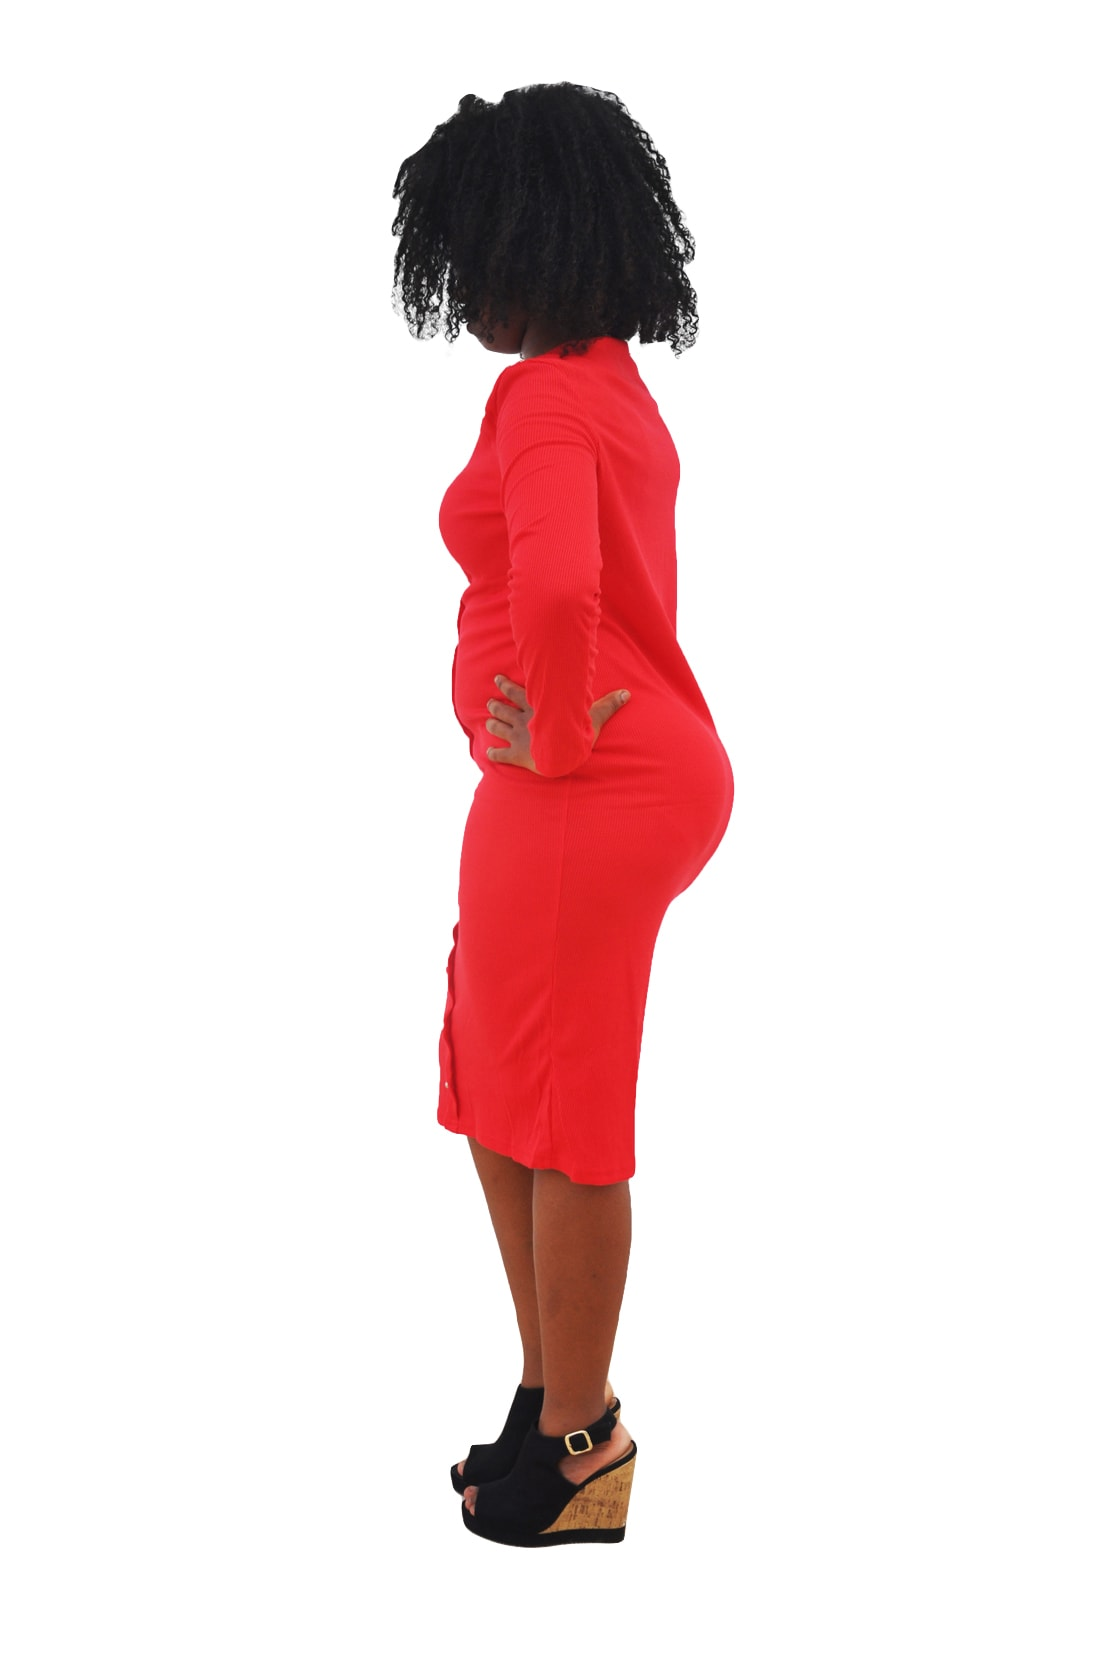 M0253 red2 Office Evening Dresses maureens.com boutique